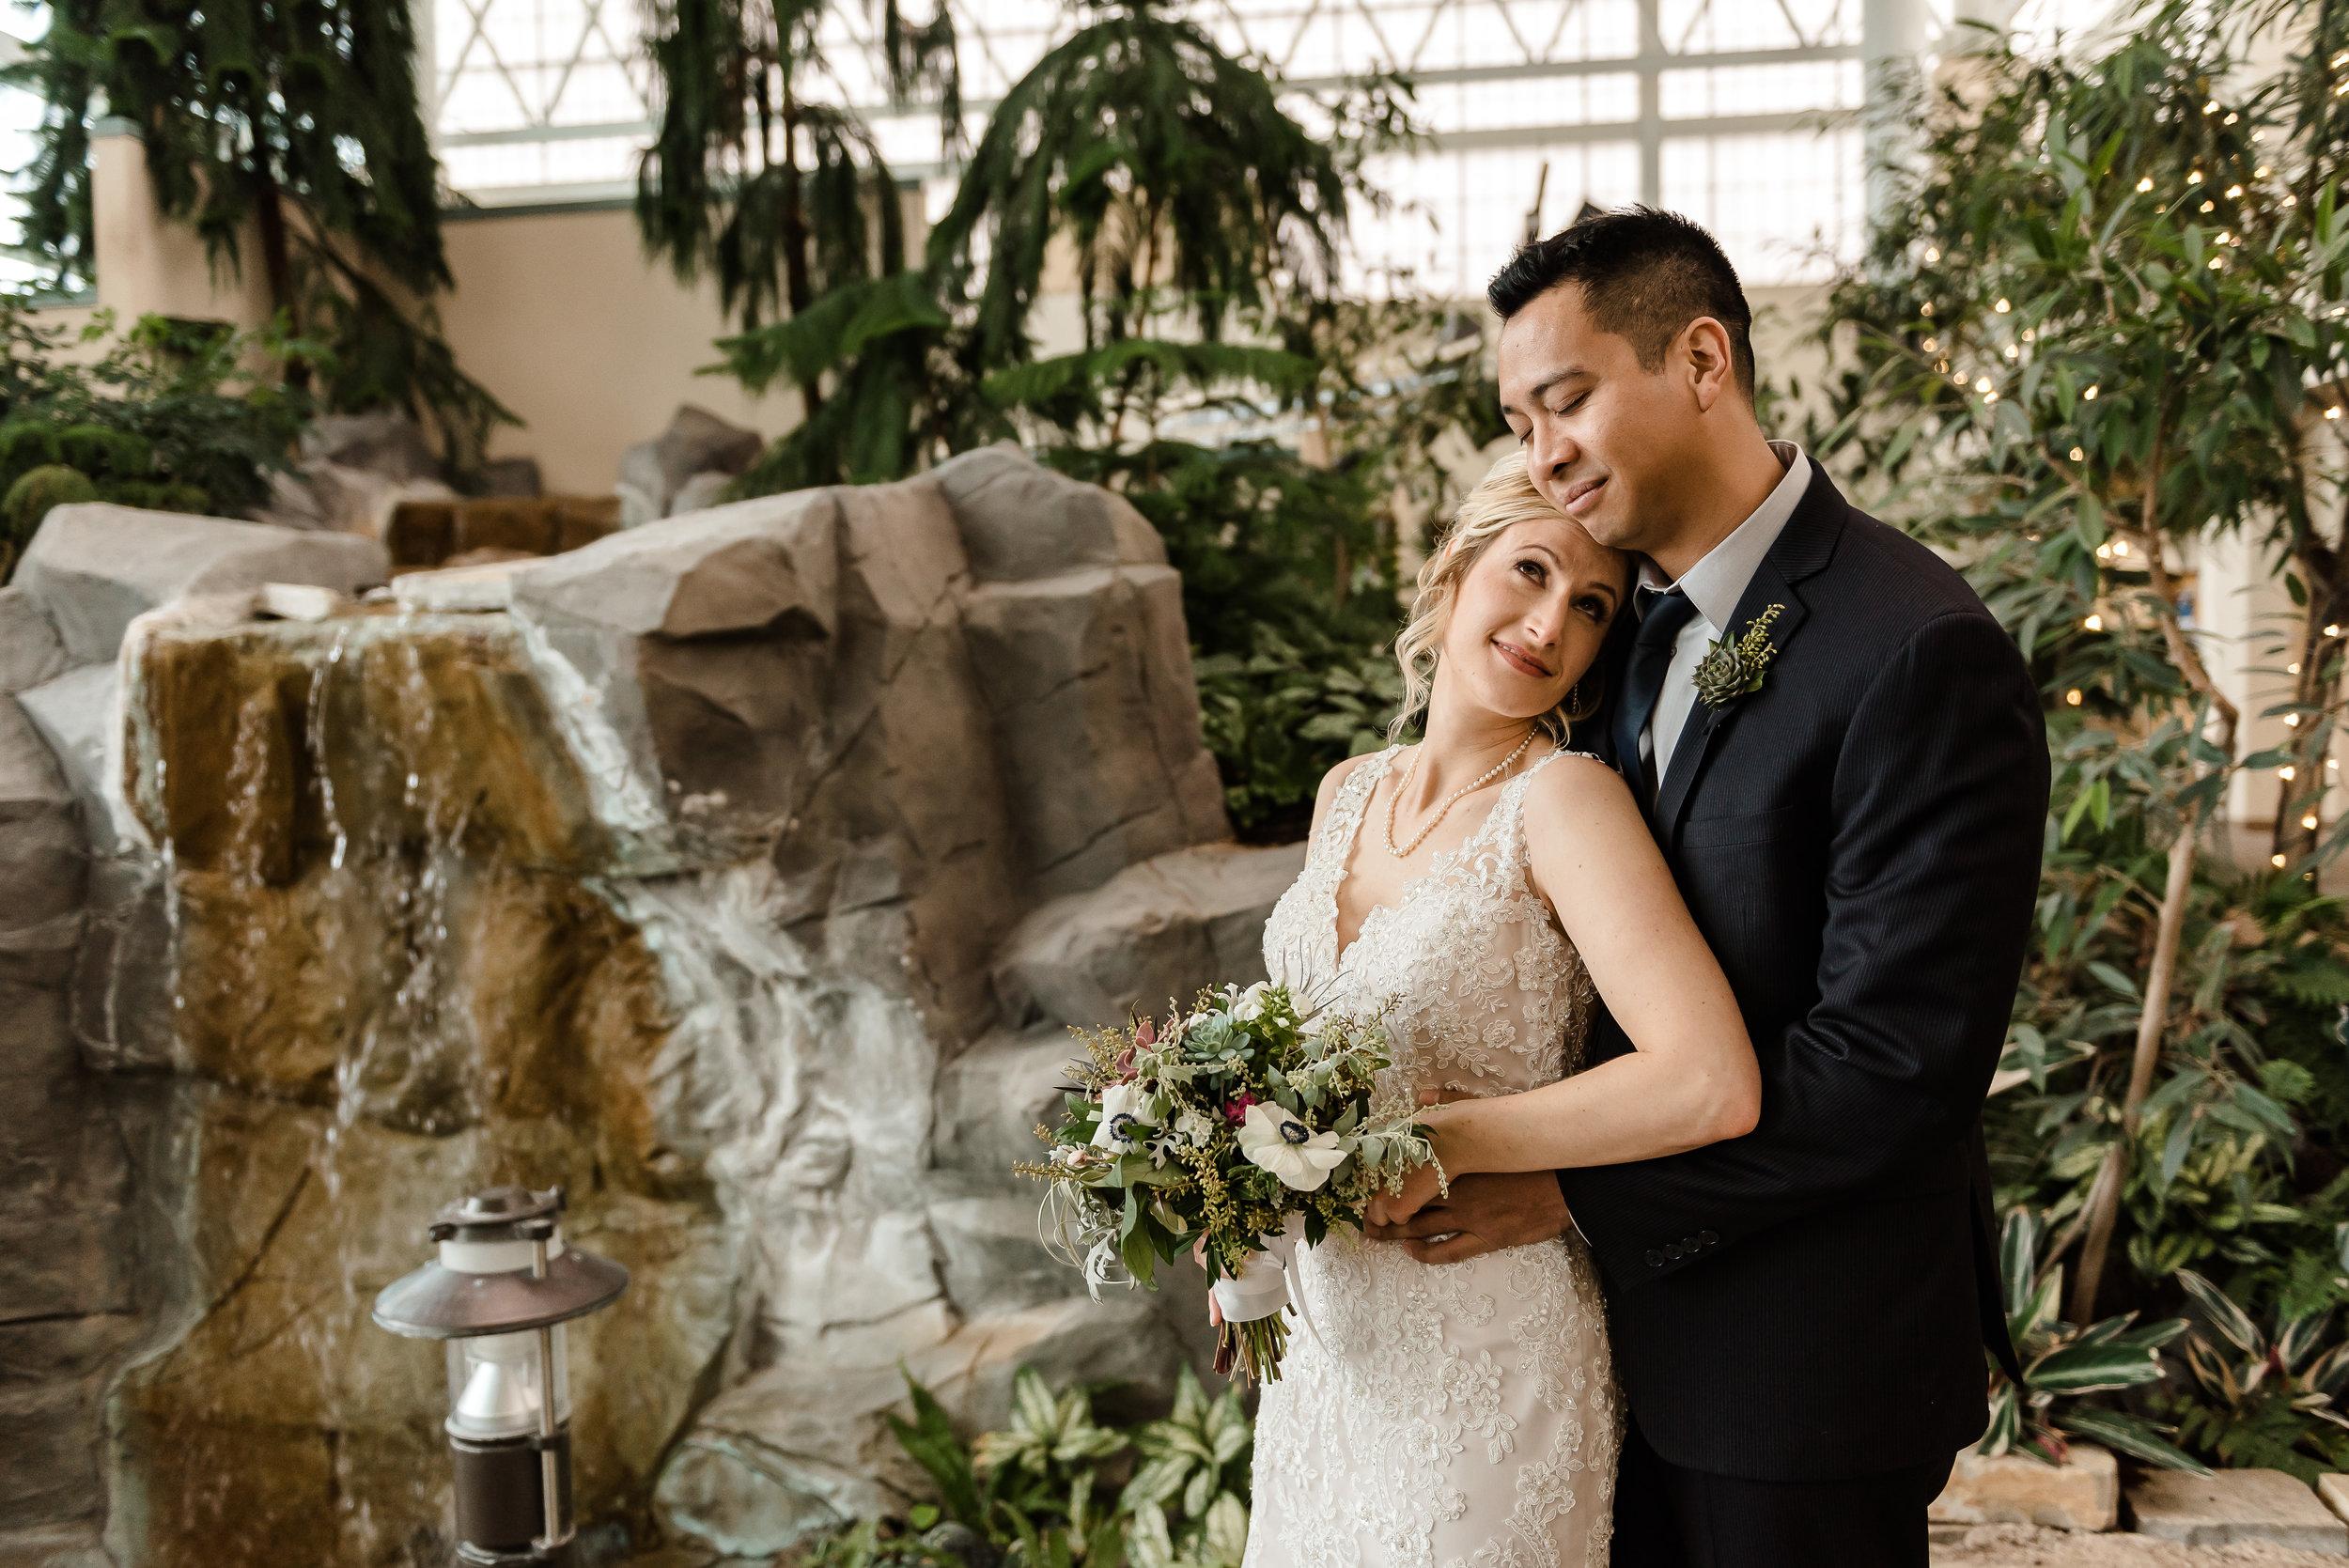 Kristin and Marlon - Wedding - Central Park Woodbury-247.jpg